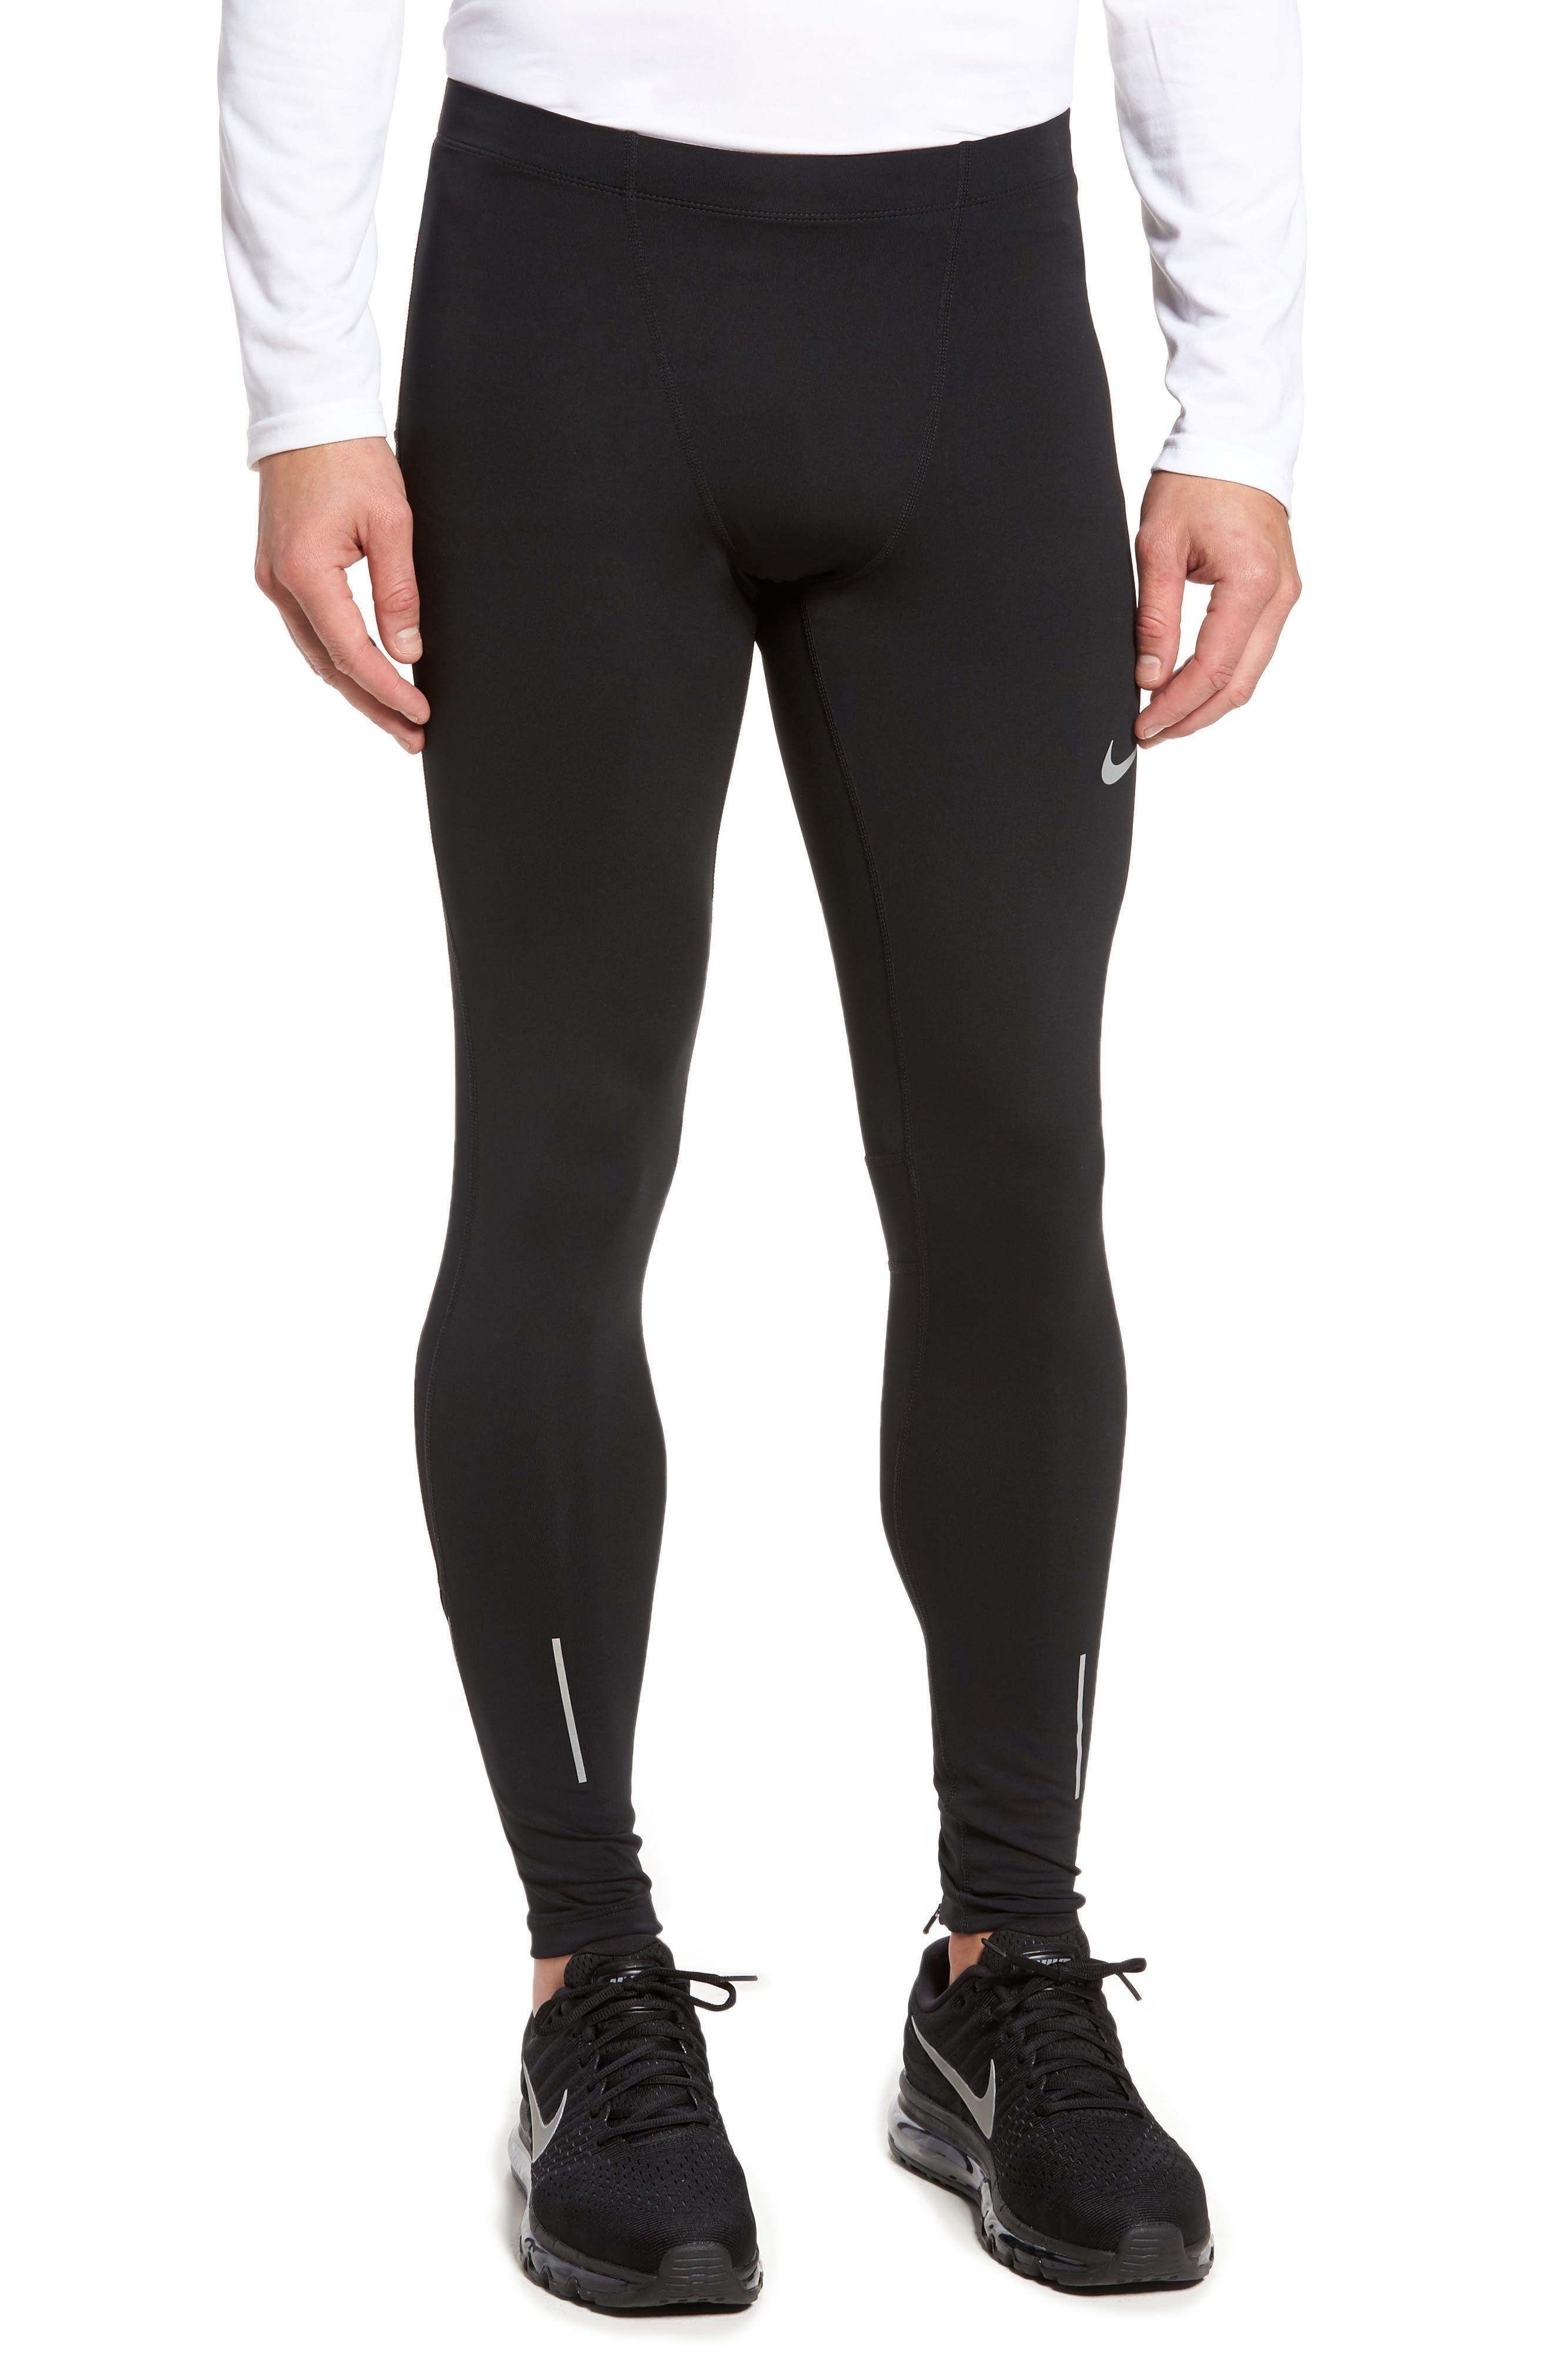 Main Image - Nike Therma Dry Running Tights